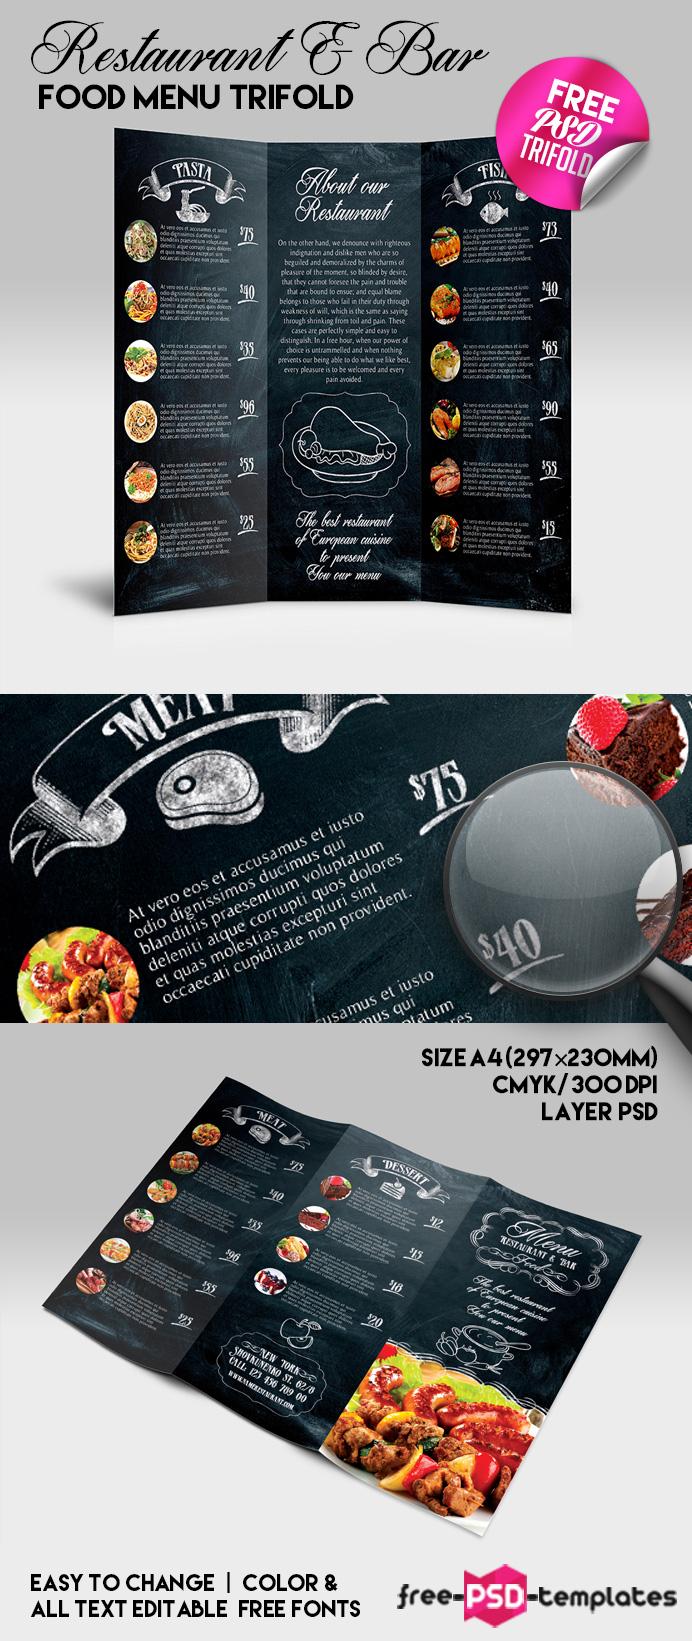 the fold menu